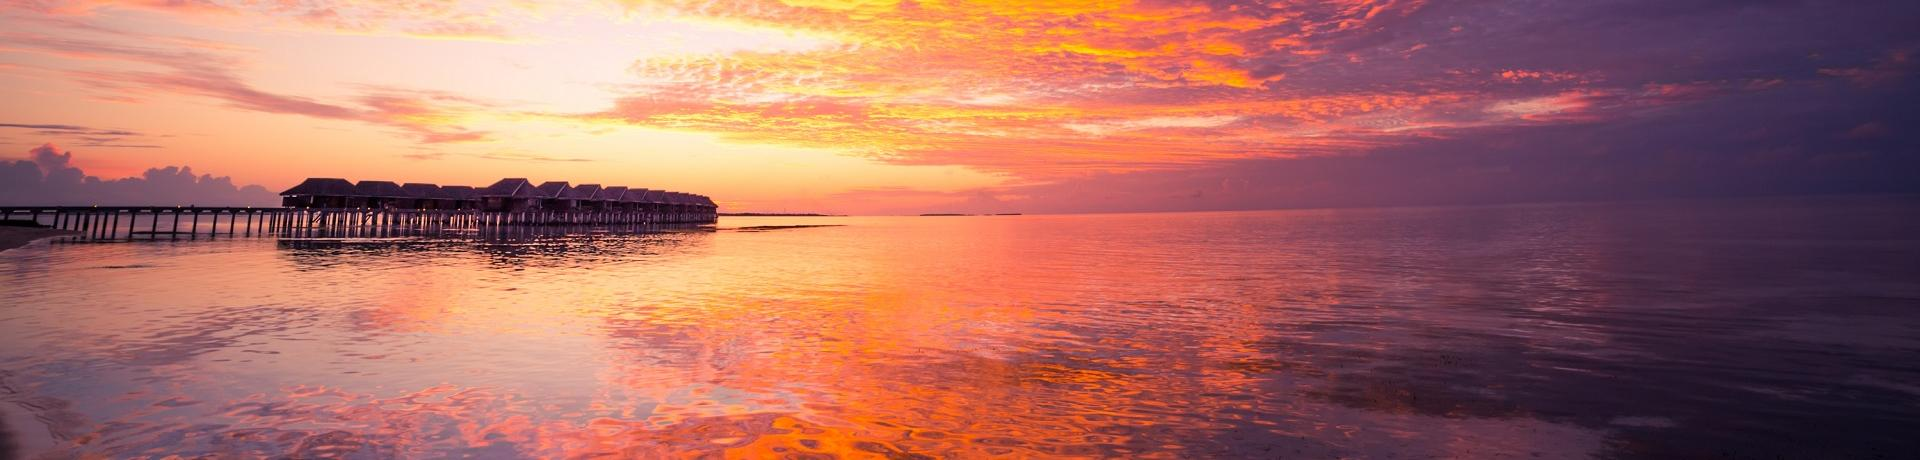 Malediven: Sonnenuntergang I - Emotion